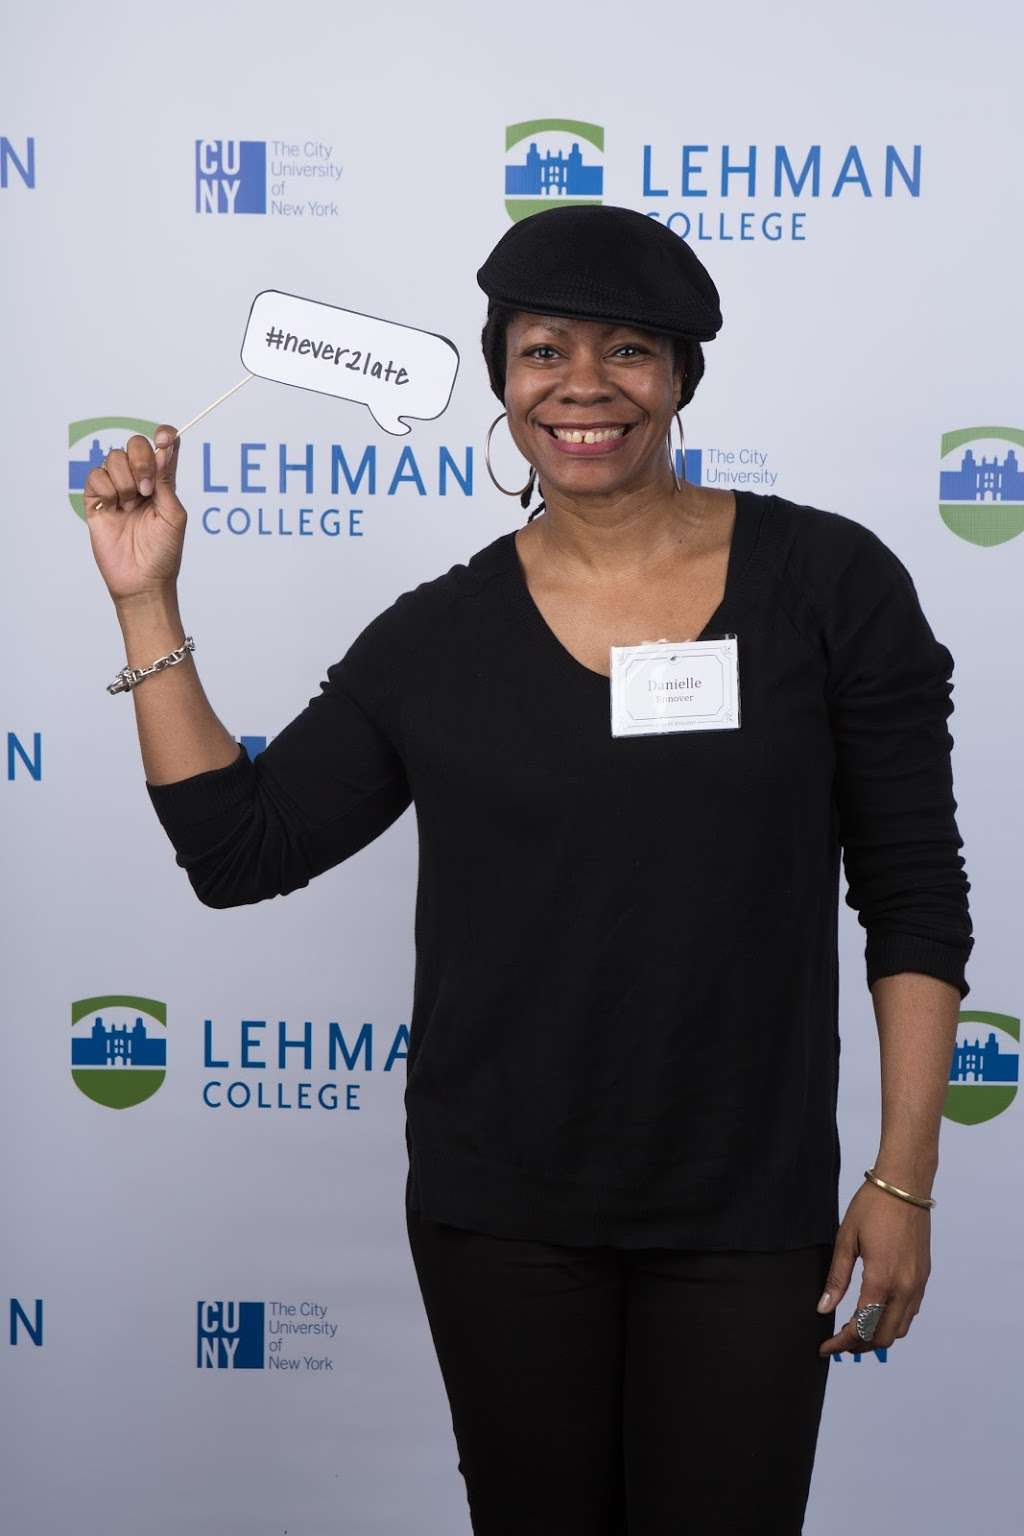 Lehman College Adult Degree Program - university  | Photo 1 of 2 | Address: 250 Bedford Park Blvd W Carman, hall room 128, Bronx, NY 10468, USA | Phone: (718) 960-8666